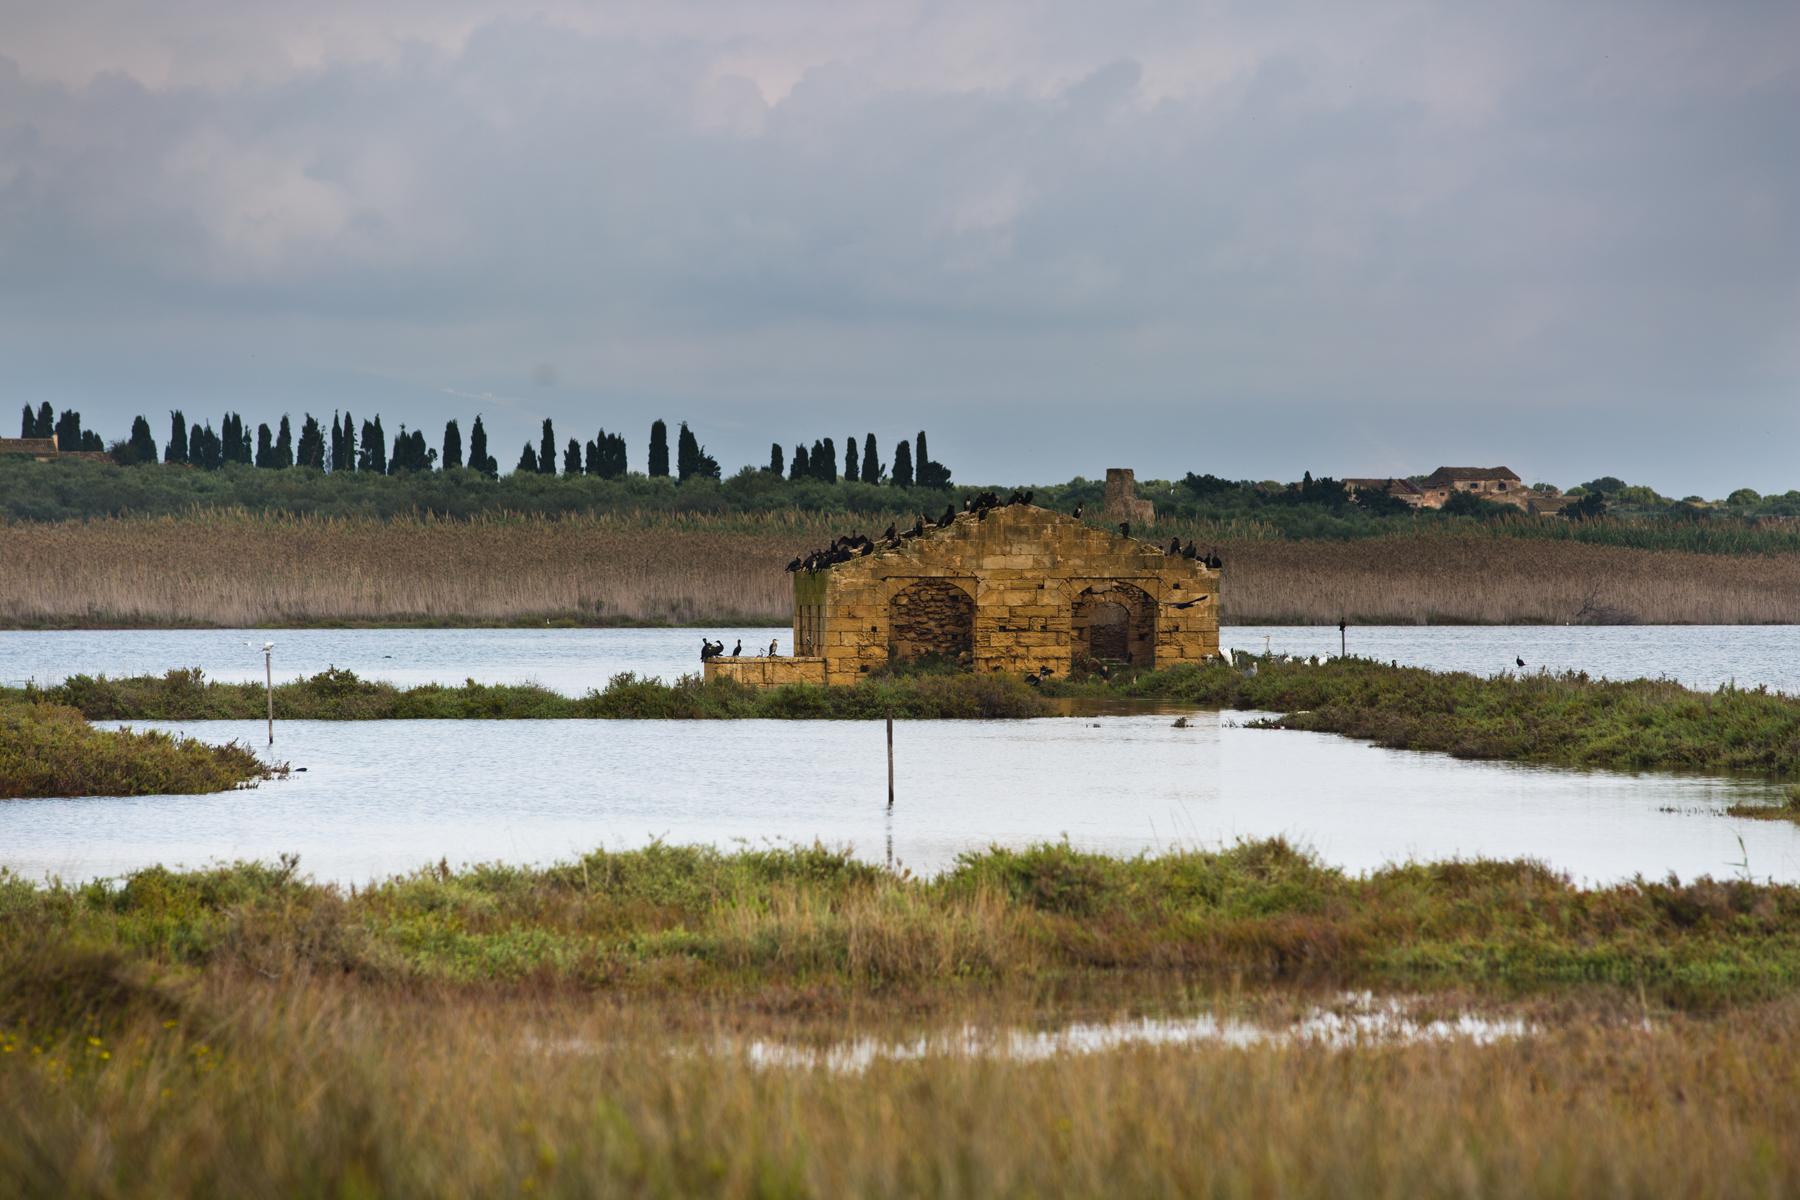 Lagune im Naturschutzgebiet